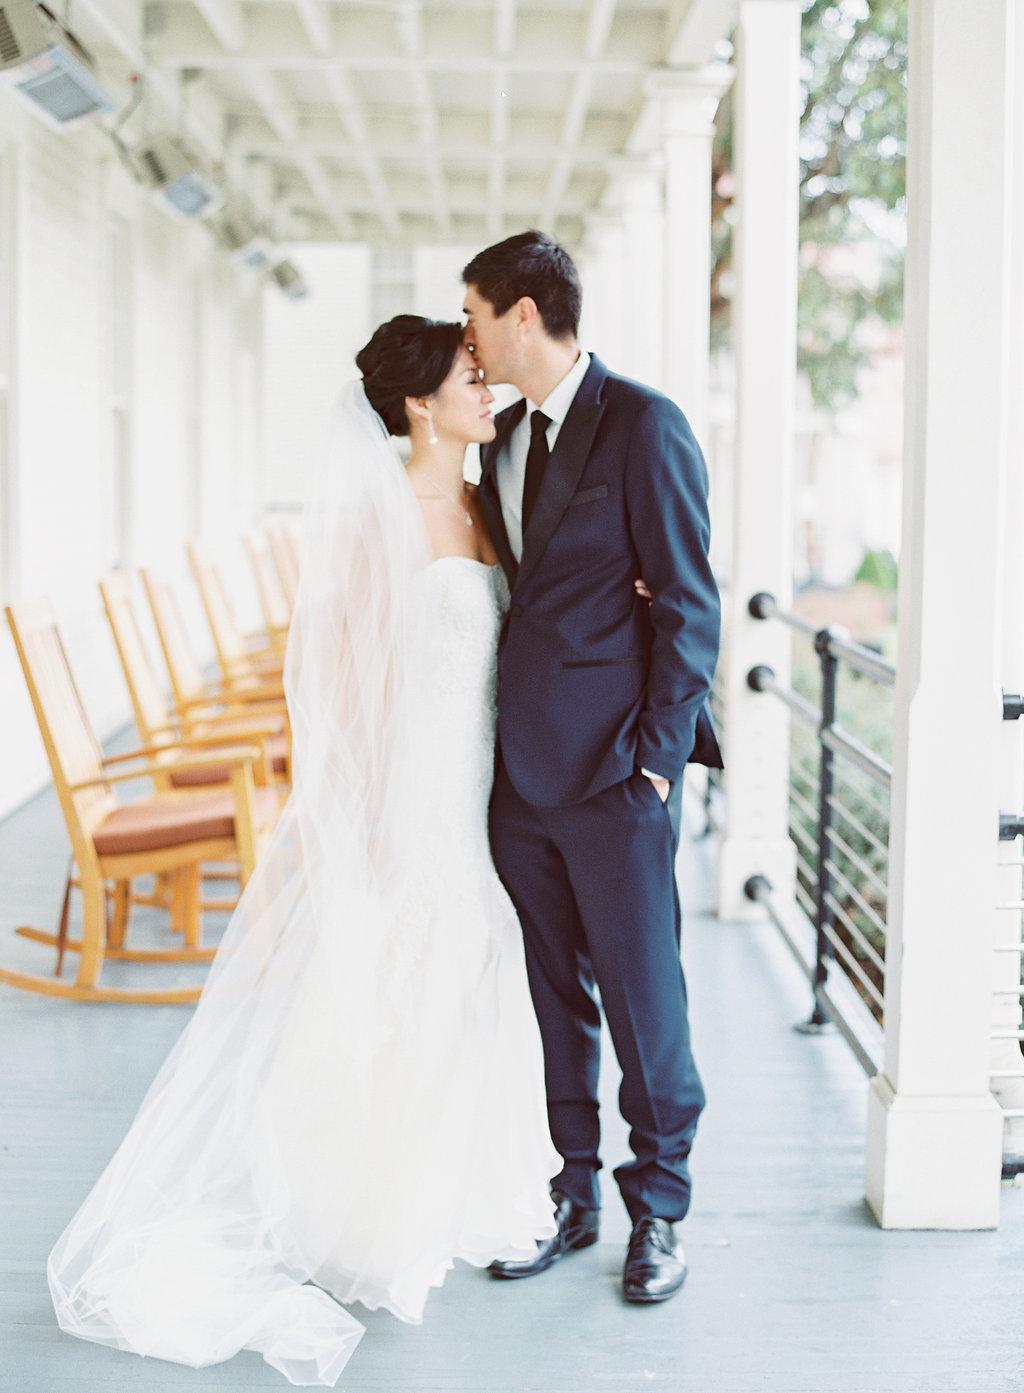 Cavallo-Point-Wedding-San-Francisco- Film-Photographer-131.jpg